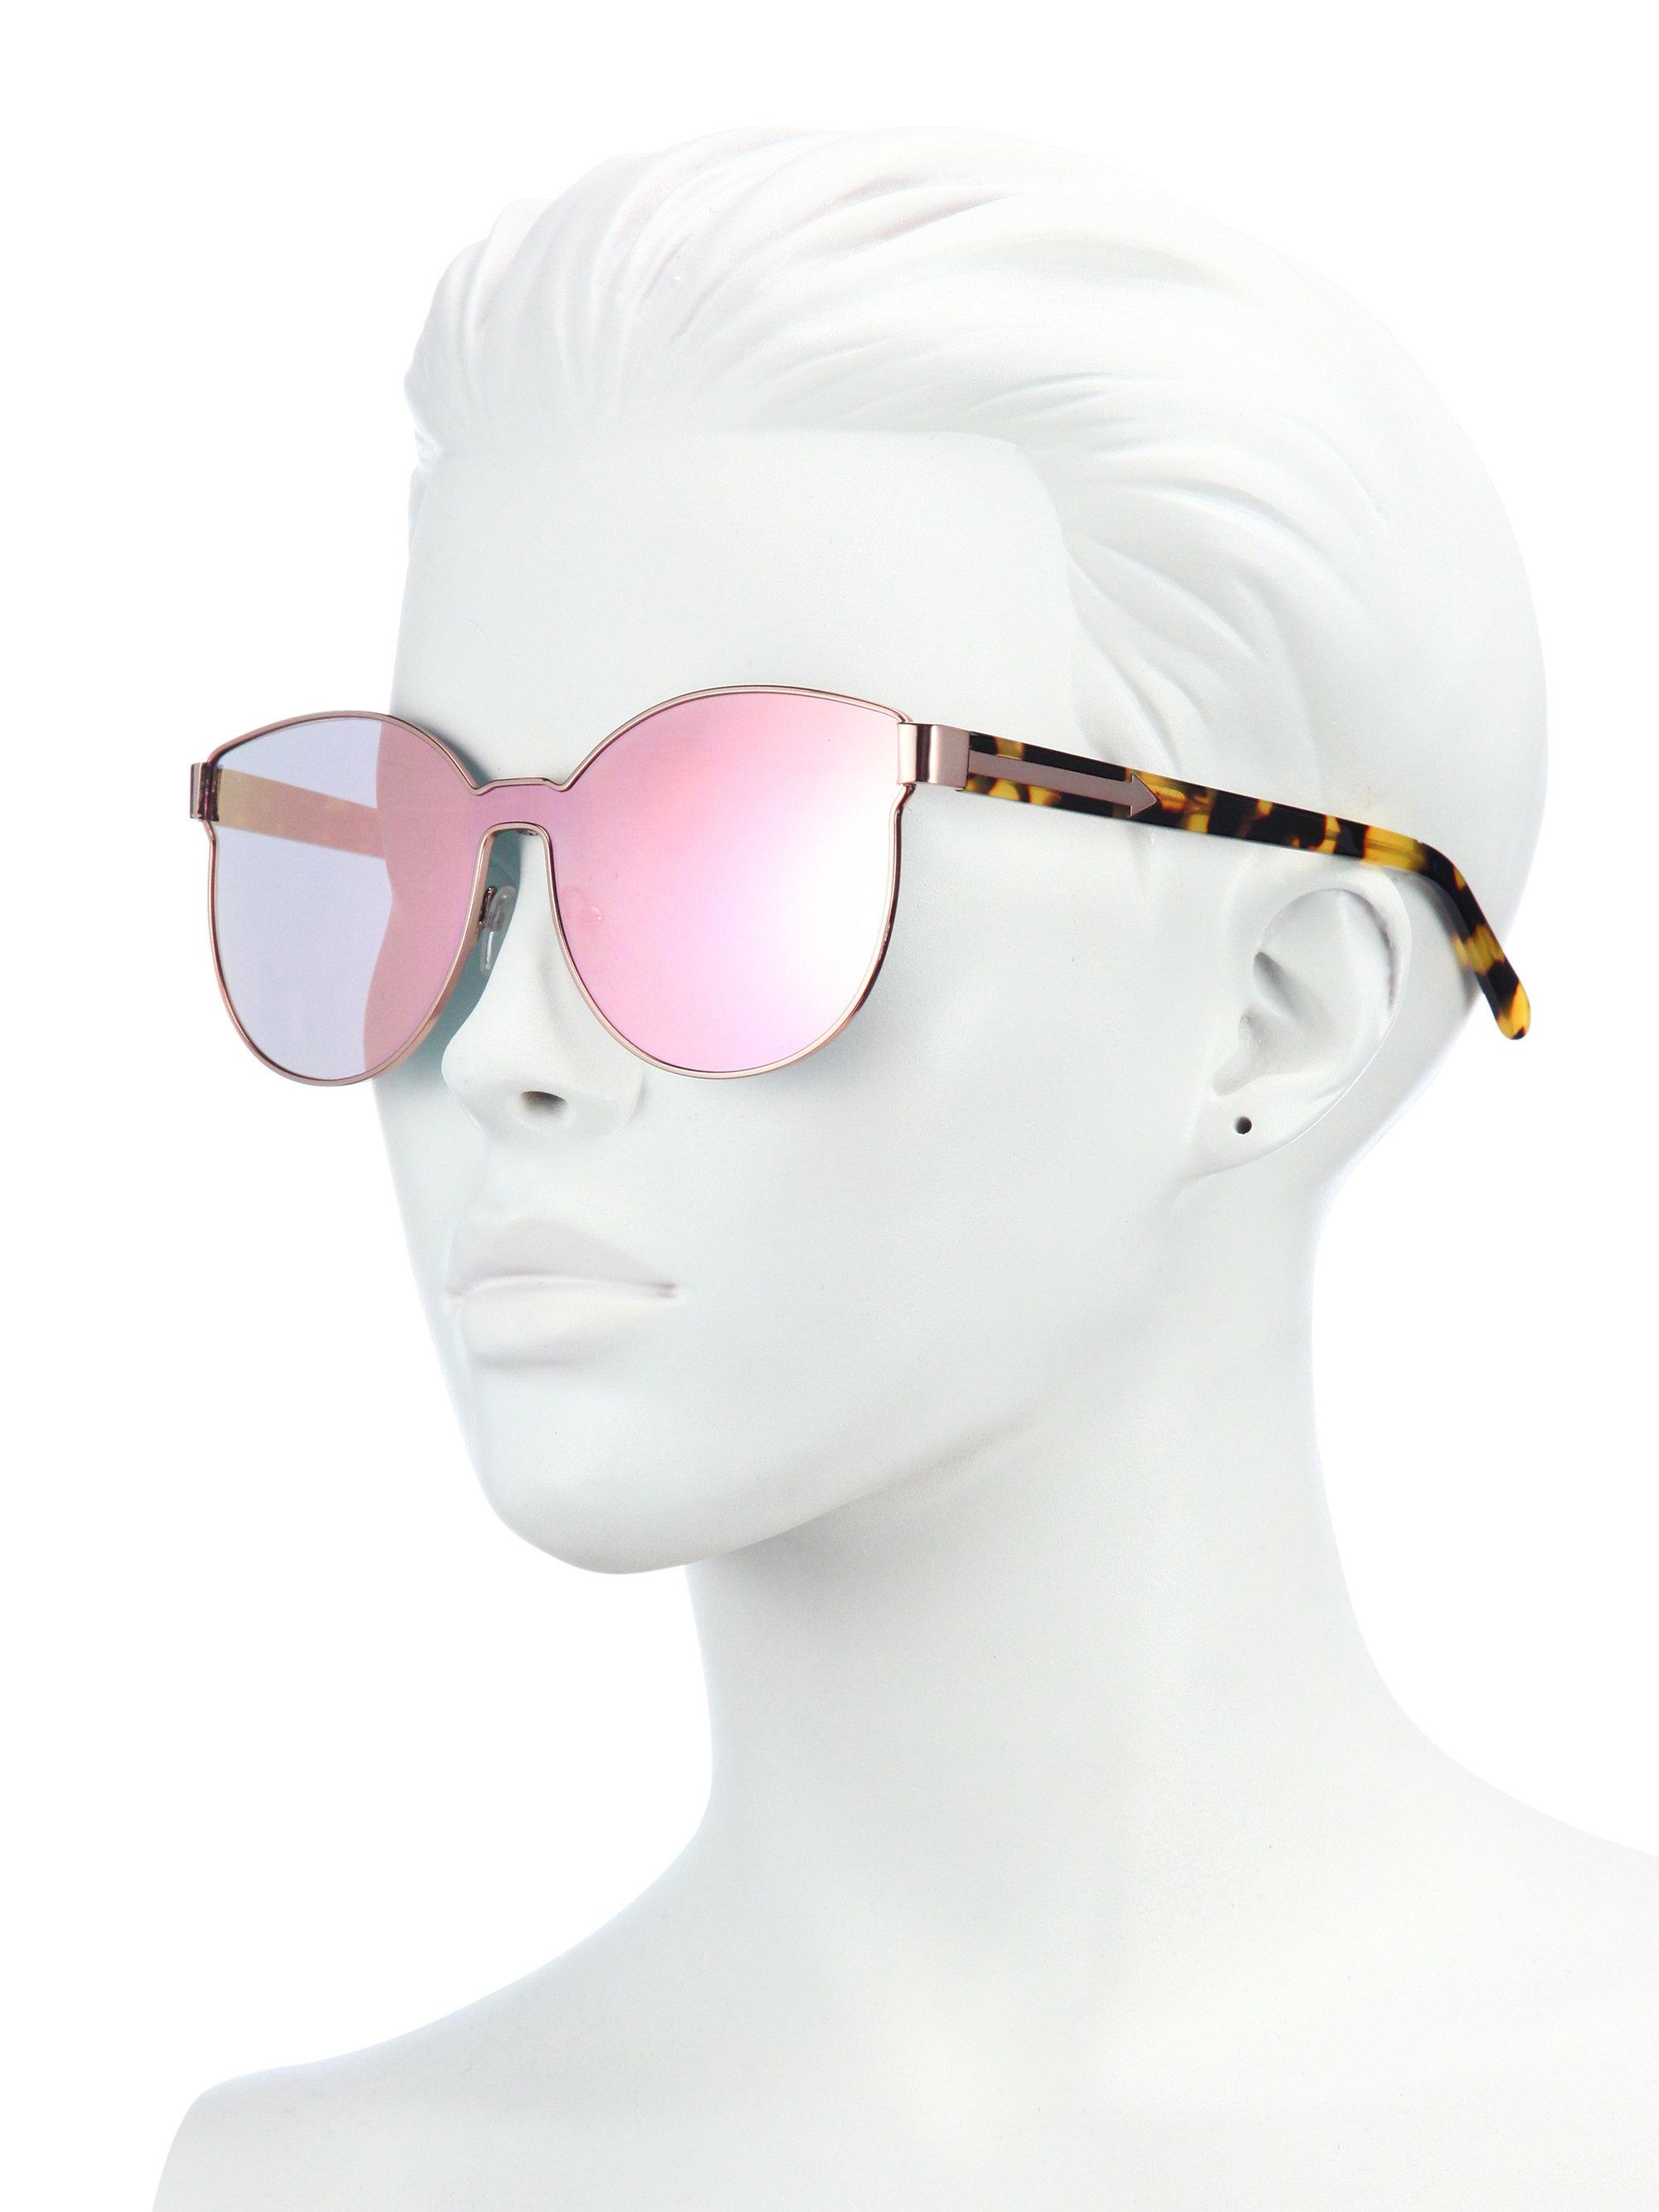 4d203809731fd Karen Walker Star Sailor Superstars 60mm Cat s-eye Sunglasses in ...